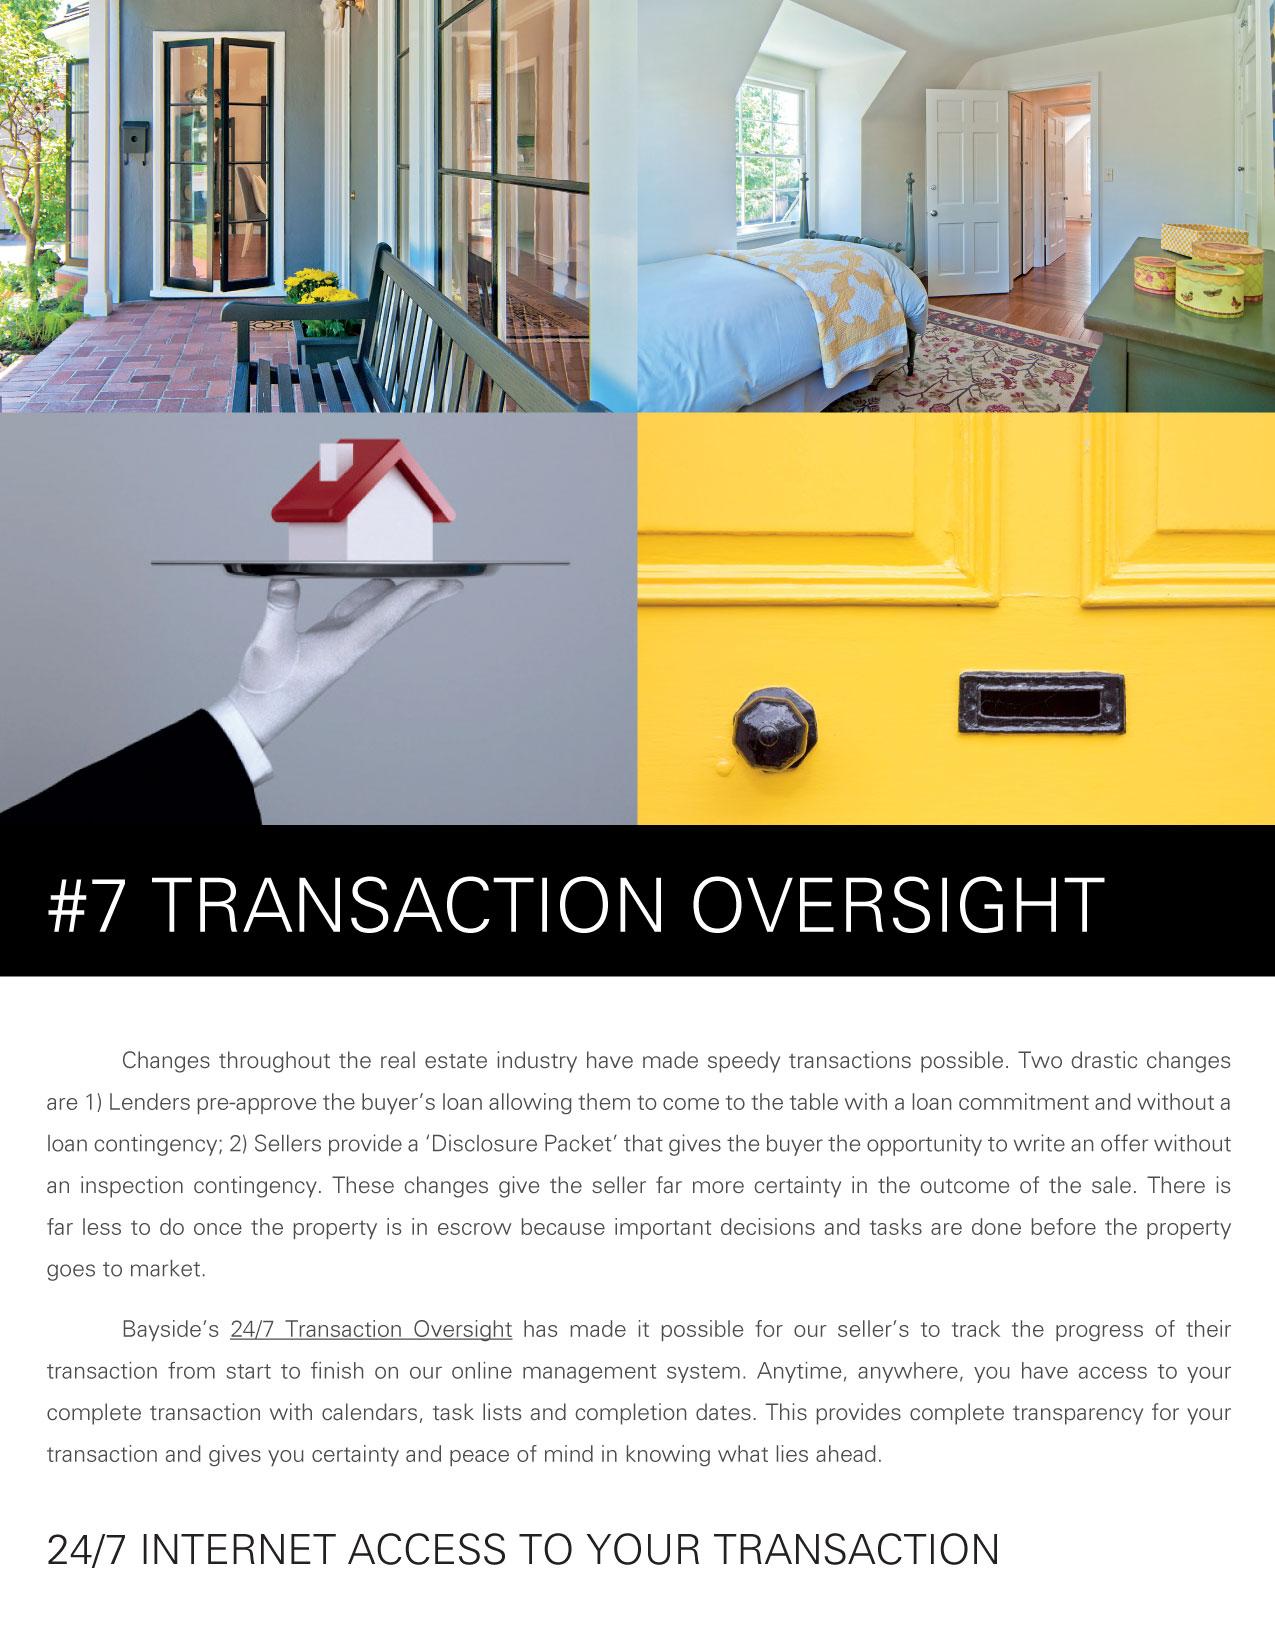 Listing Presentation - #7 Transaction Oversight